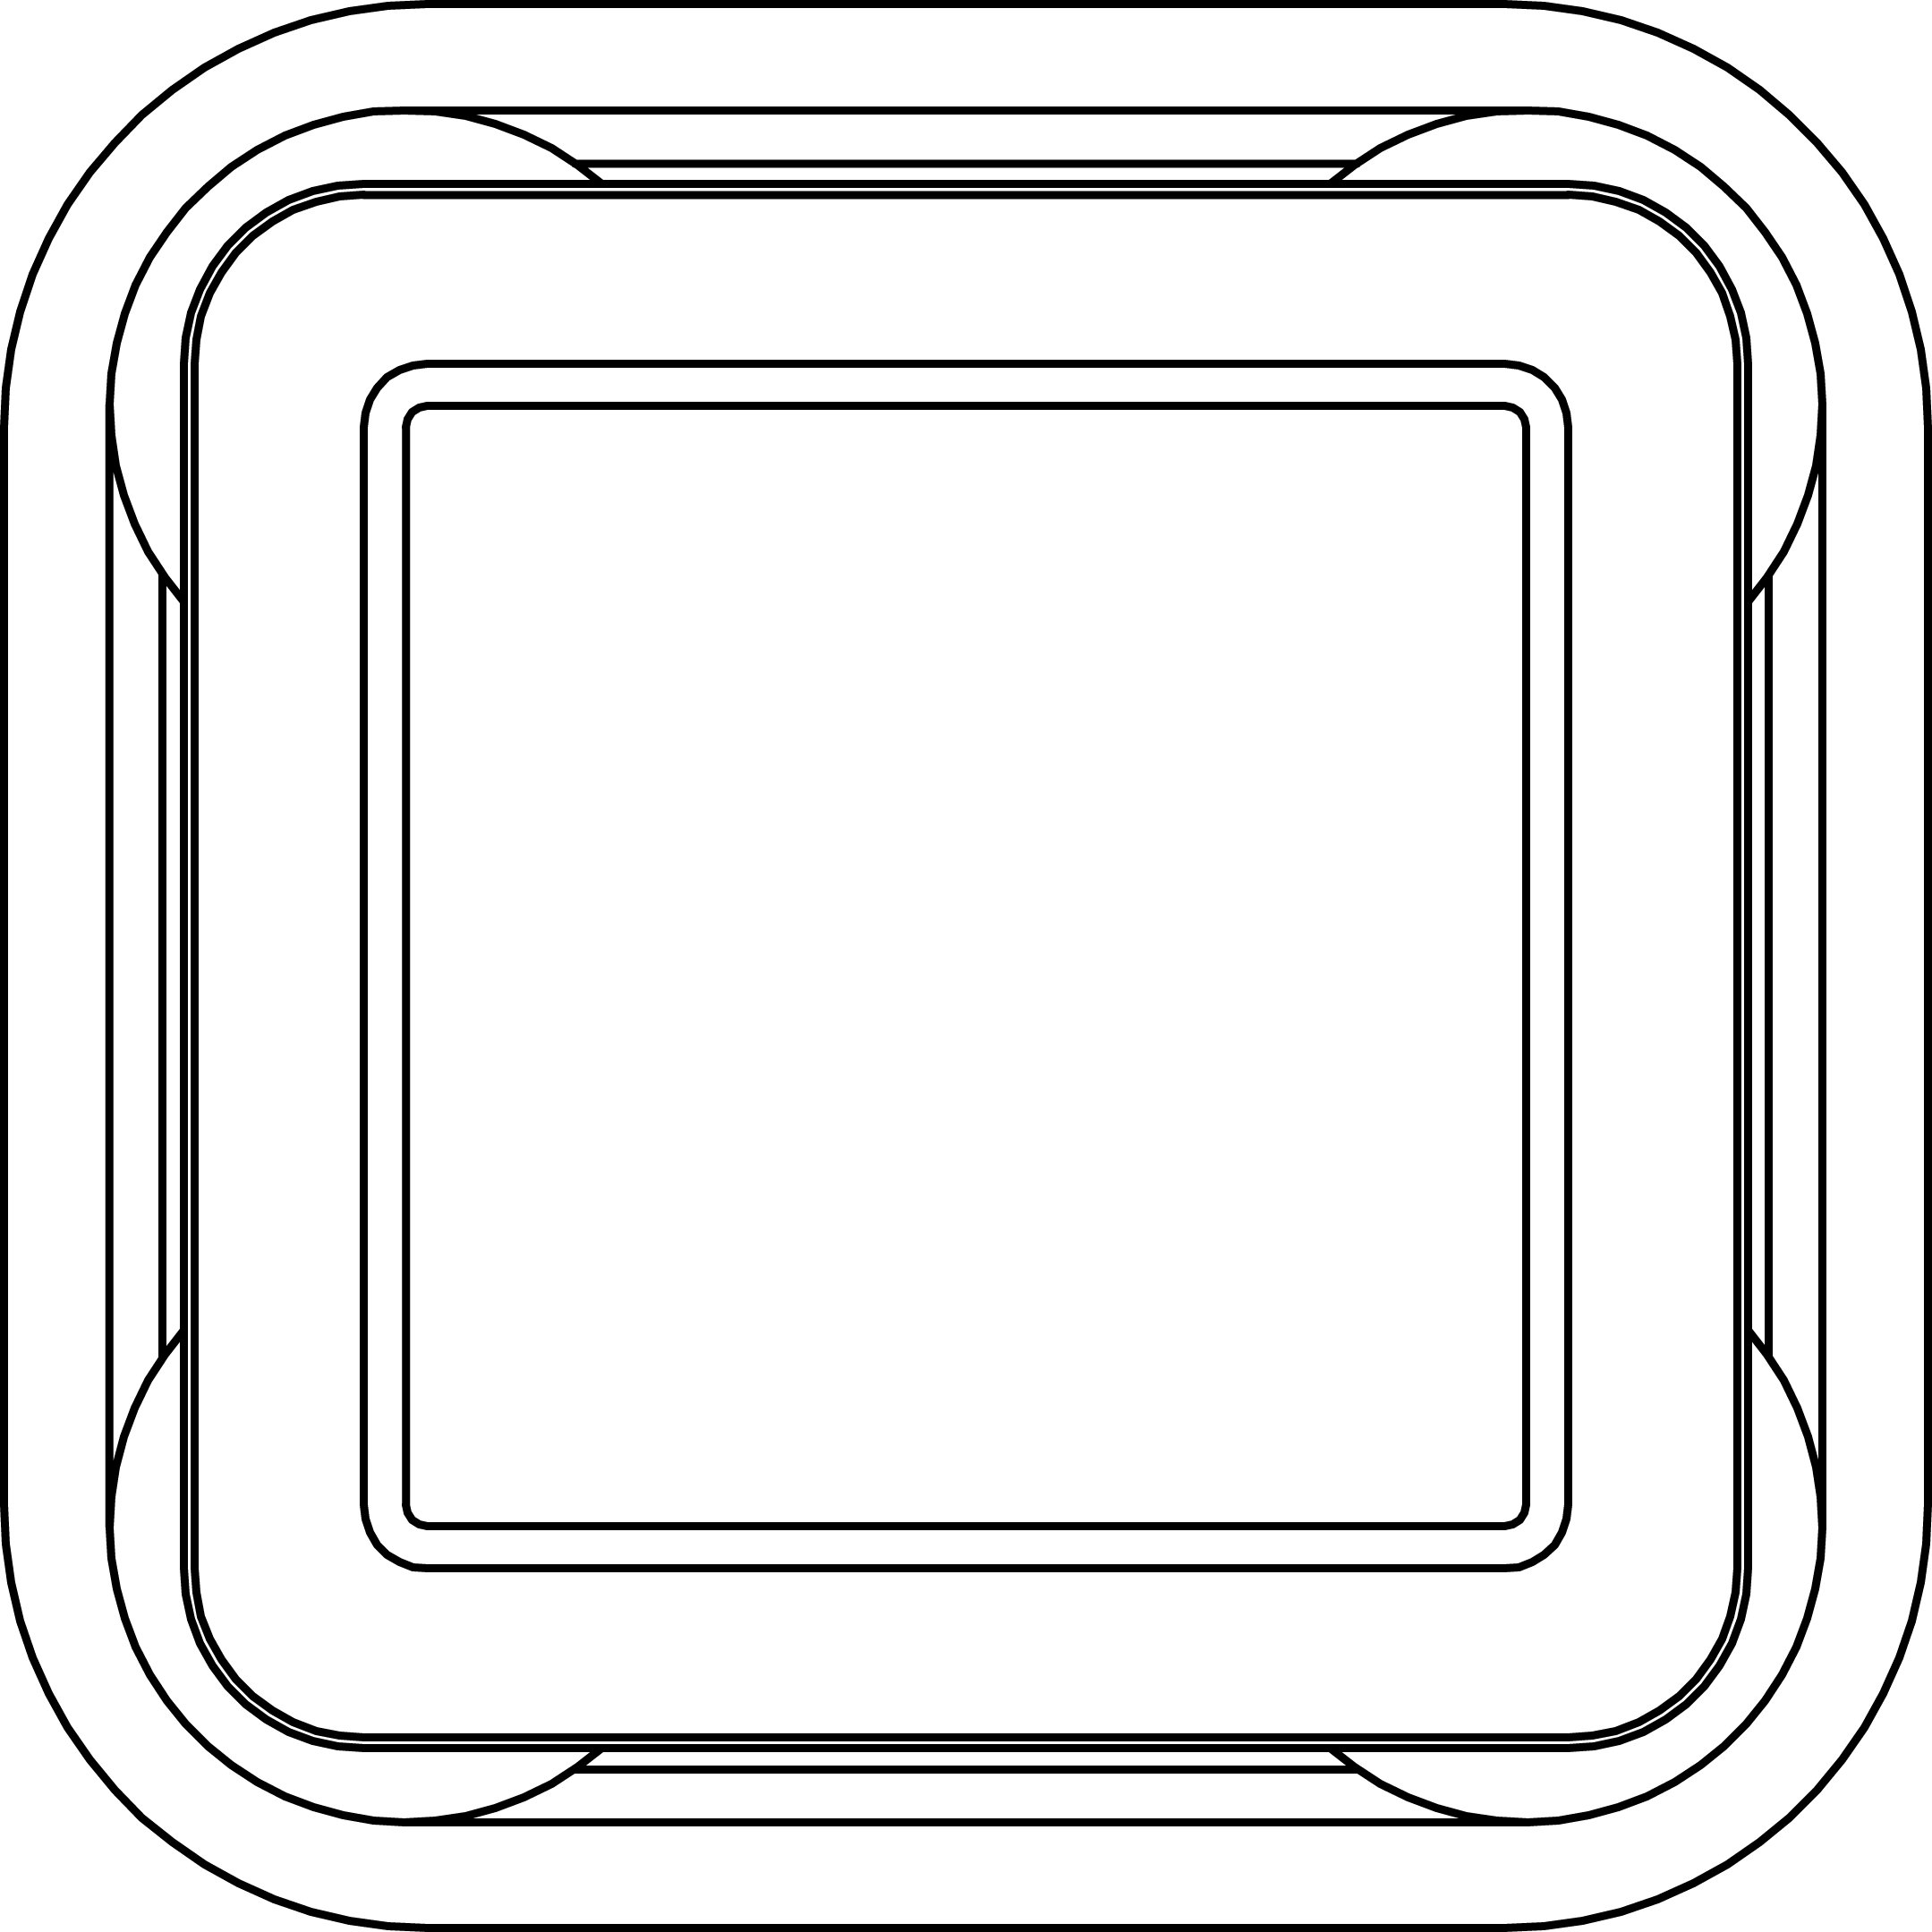 Kubek śmietana 200g (1,0)